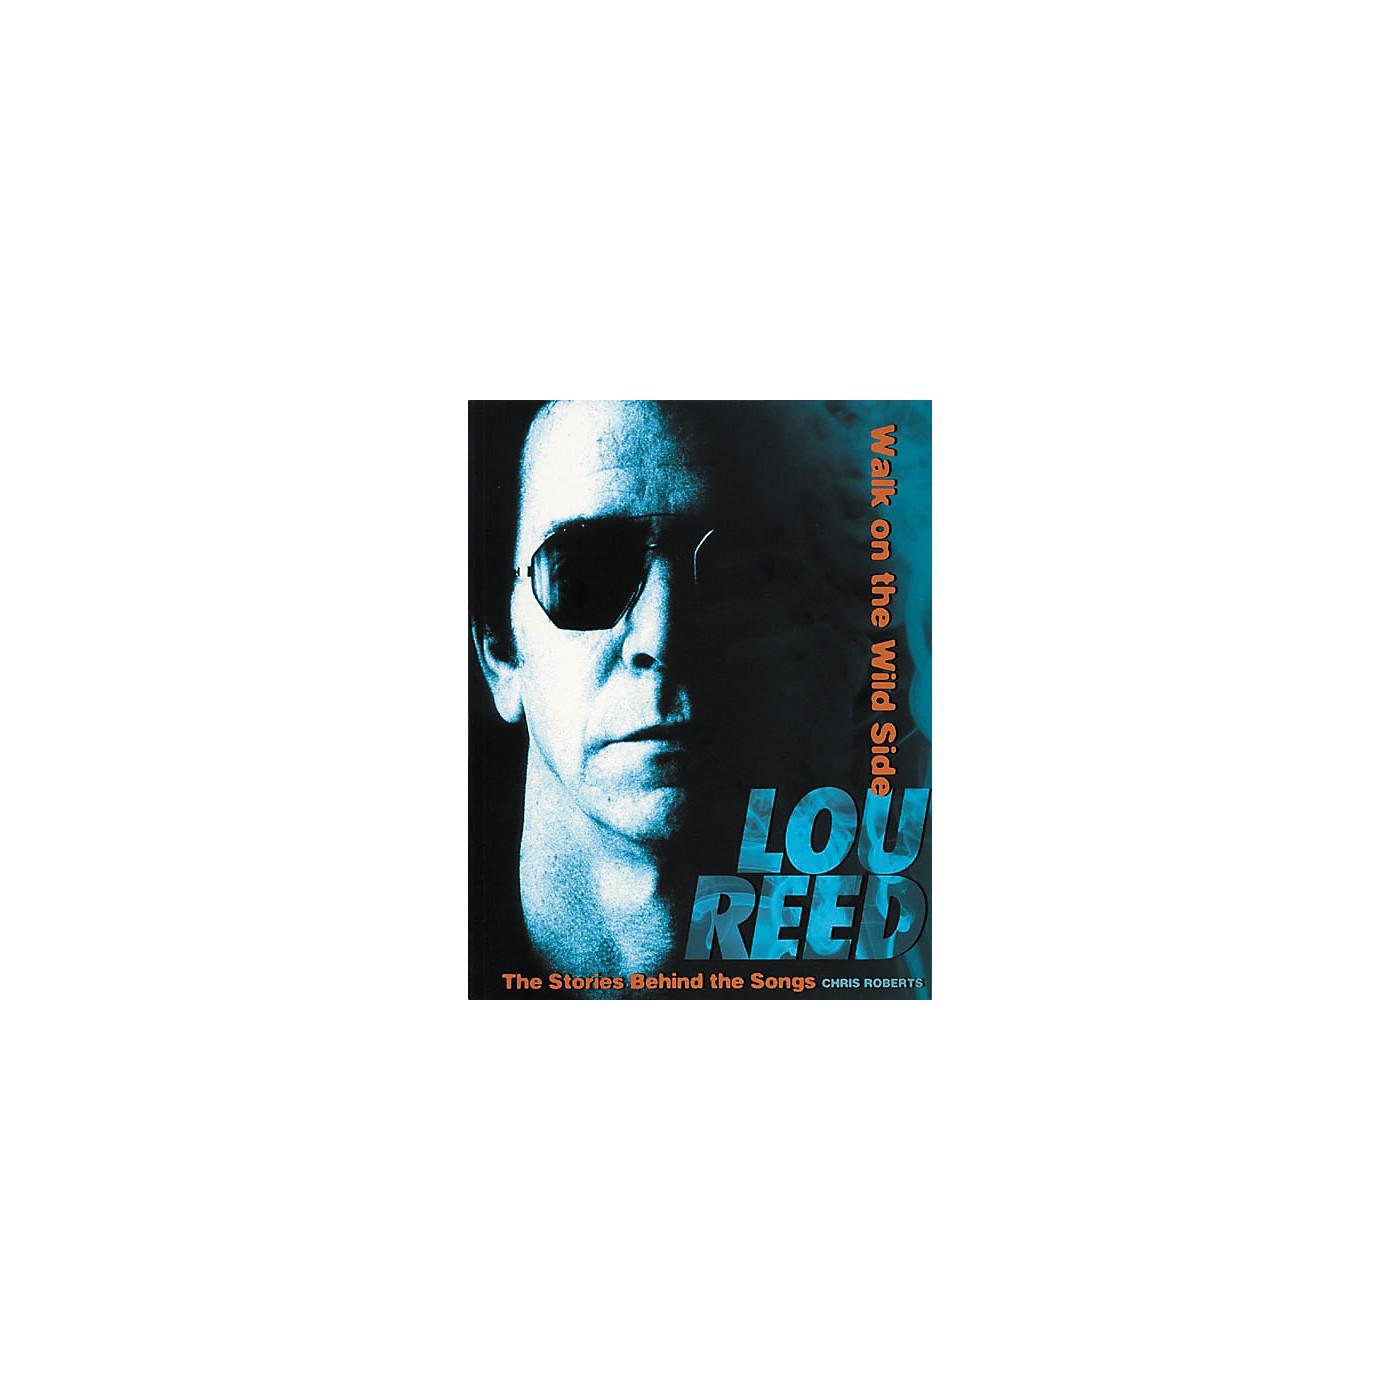 Hal Leonard Lou Reed - Walk on the Wild Side thumbnail